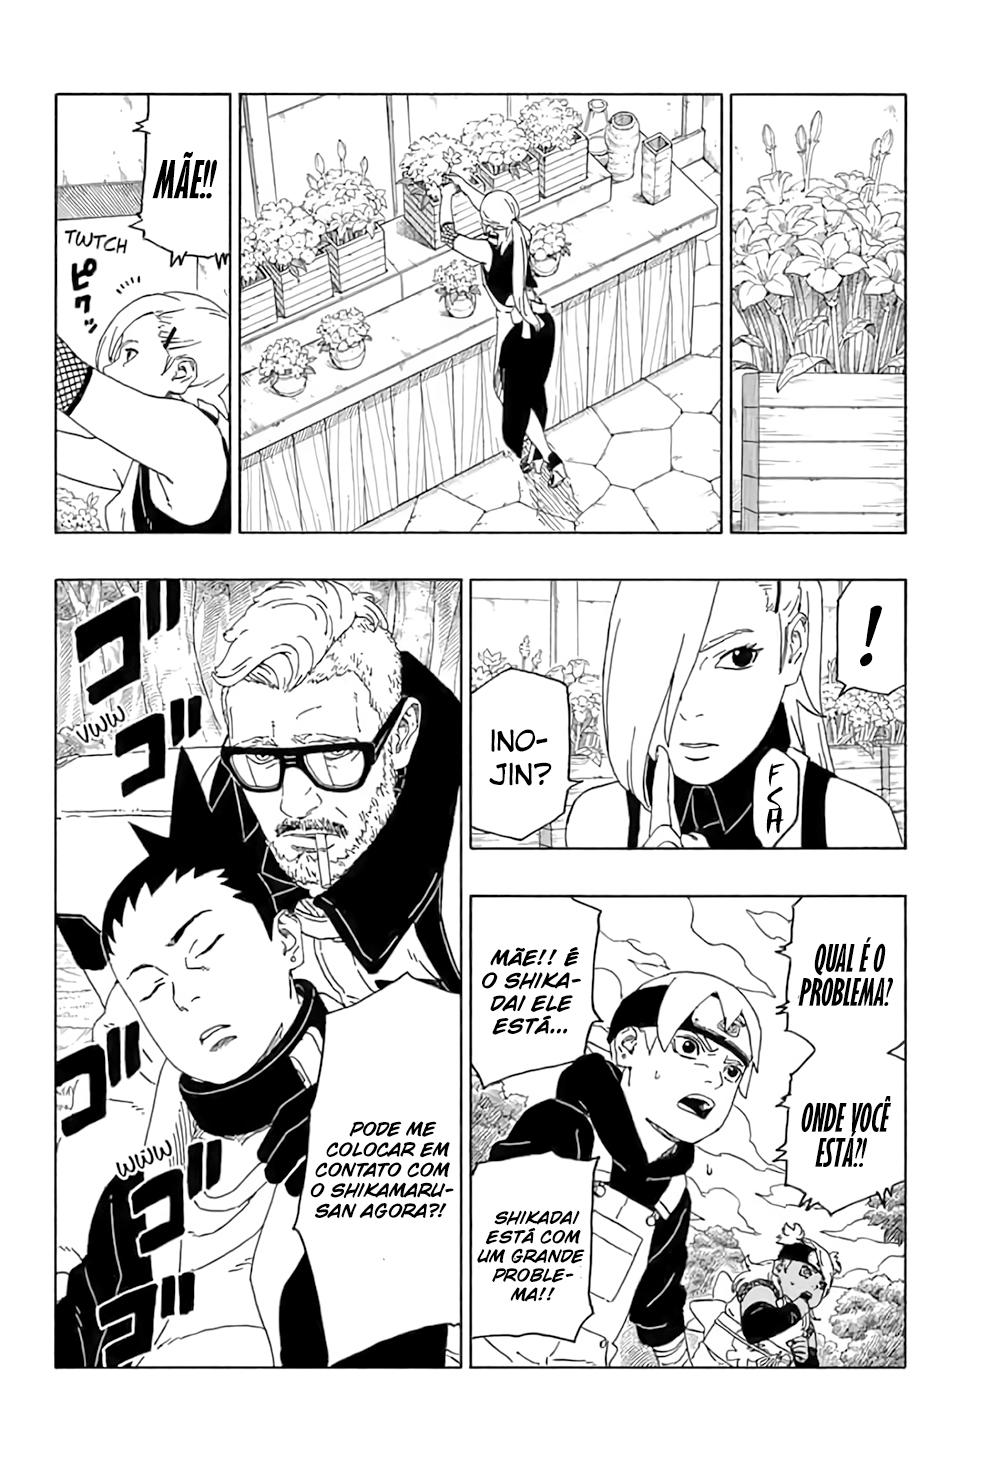 Hinata consegue identificar chacra melhor que a Ino?   30a10